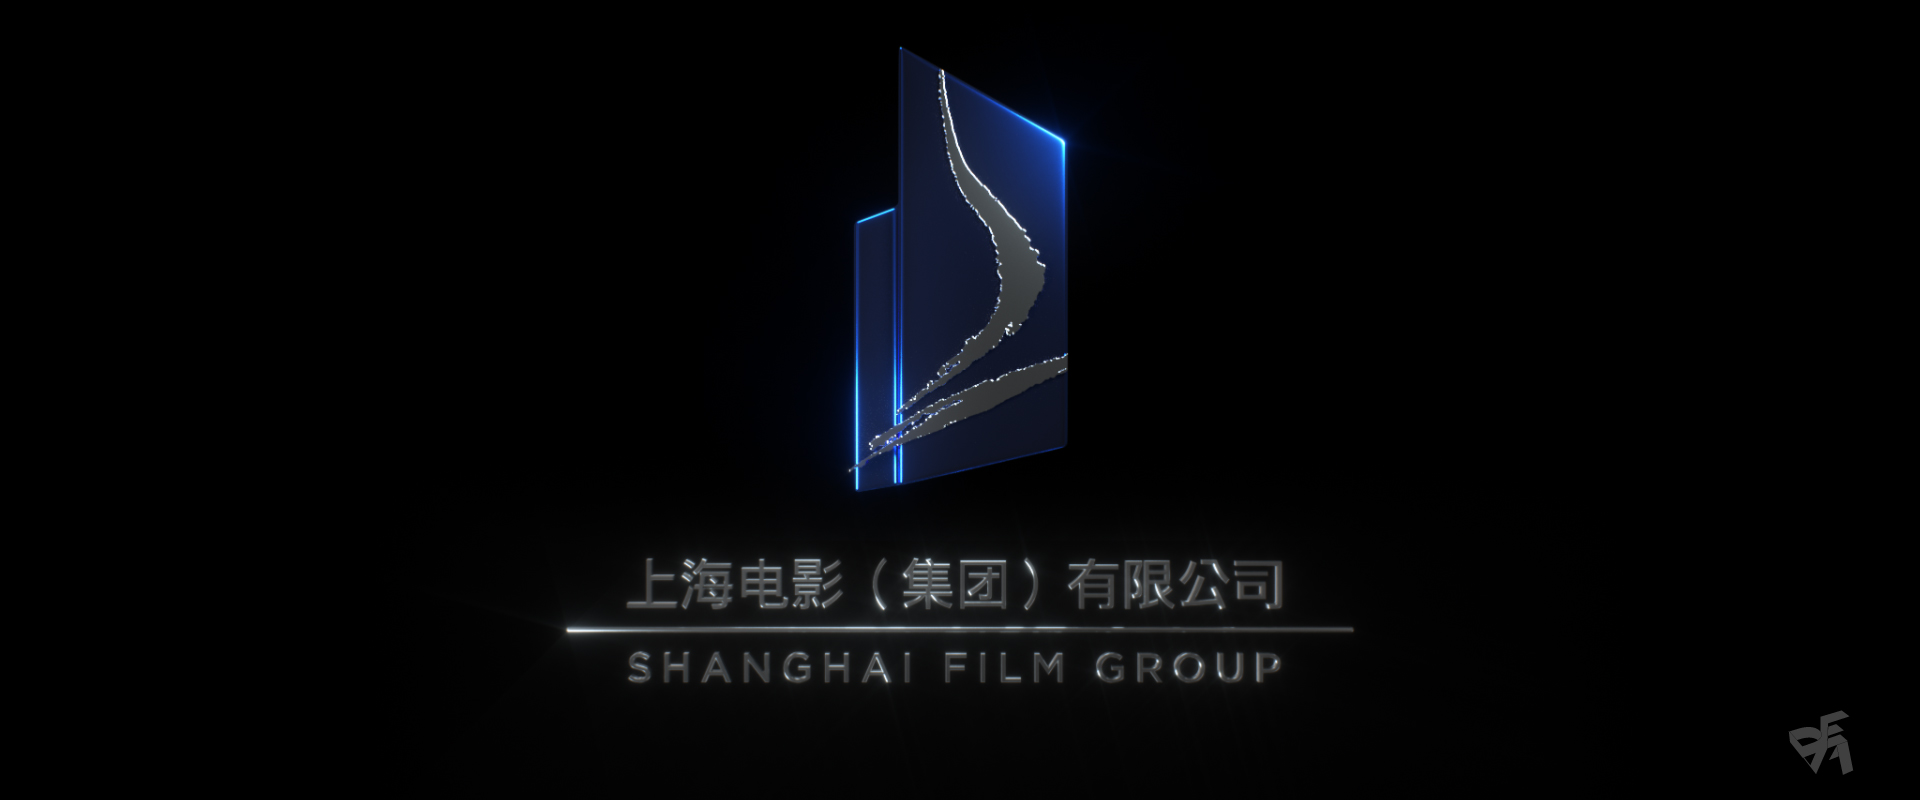 ShanghaiFilmGroup_STYLEFRAME_06.jpg